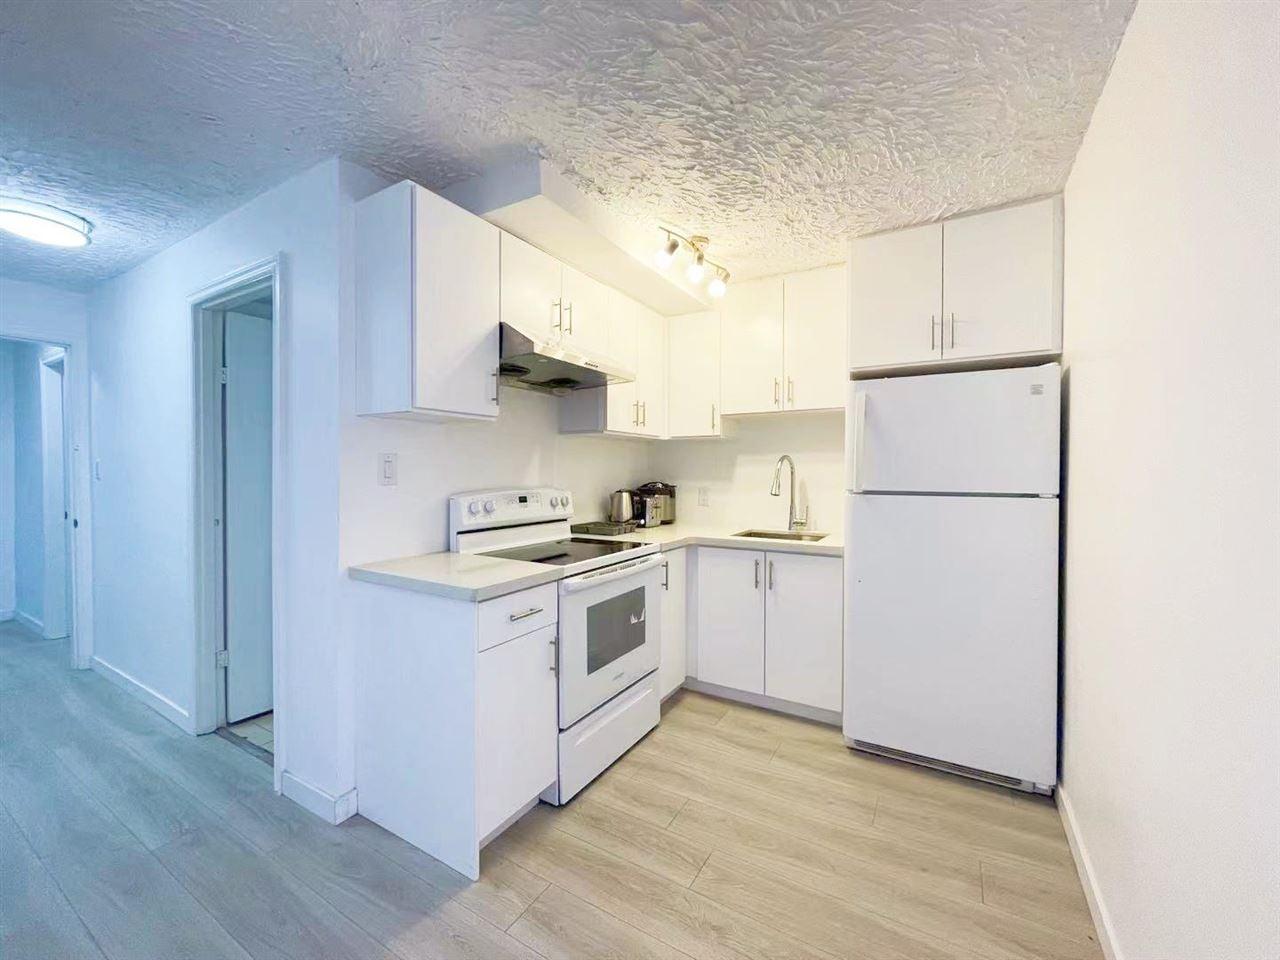 8991 ST. ALBANS ROAD - Garden City 1/2 Duplex for sale, 5 Bedrooms (R2576083) - #16